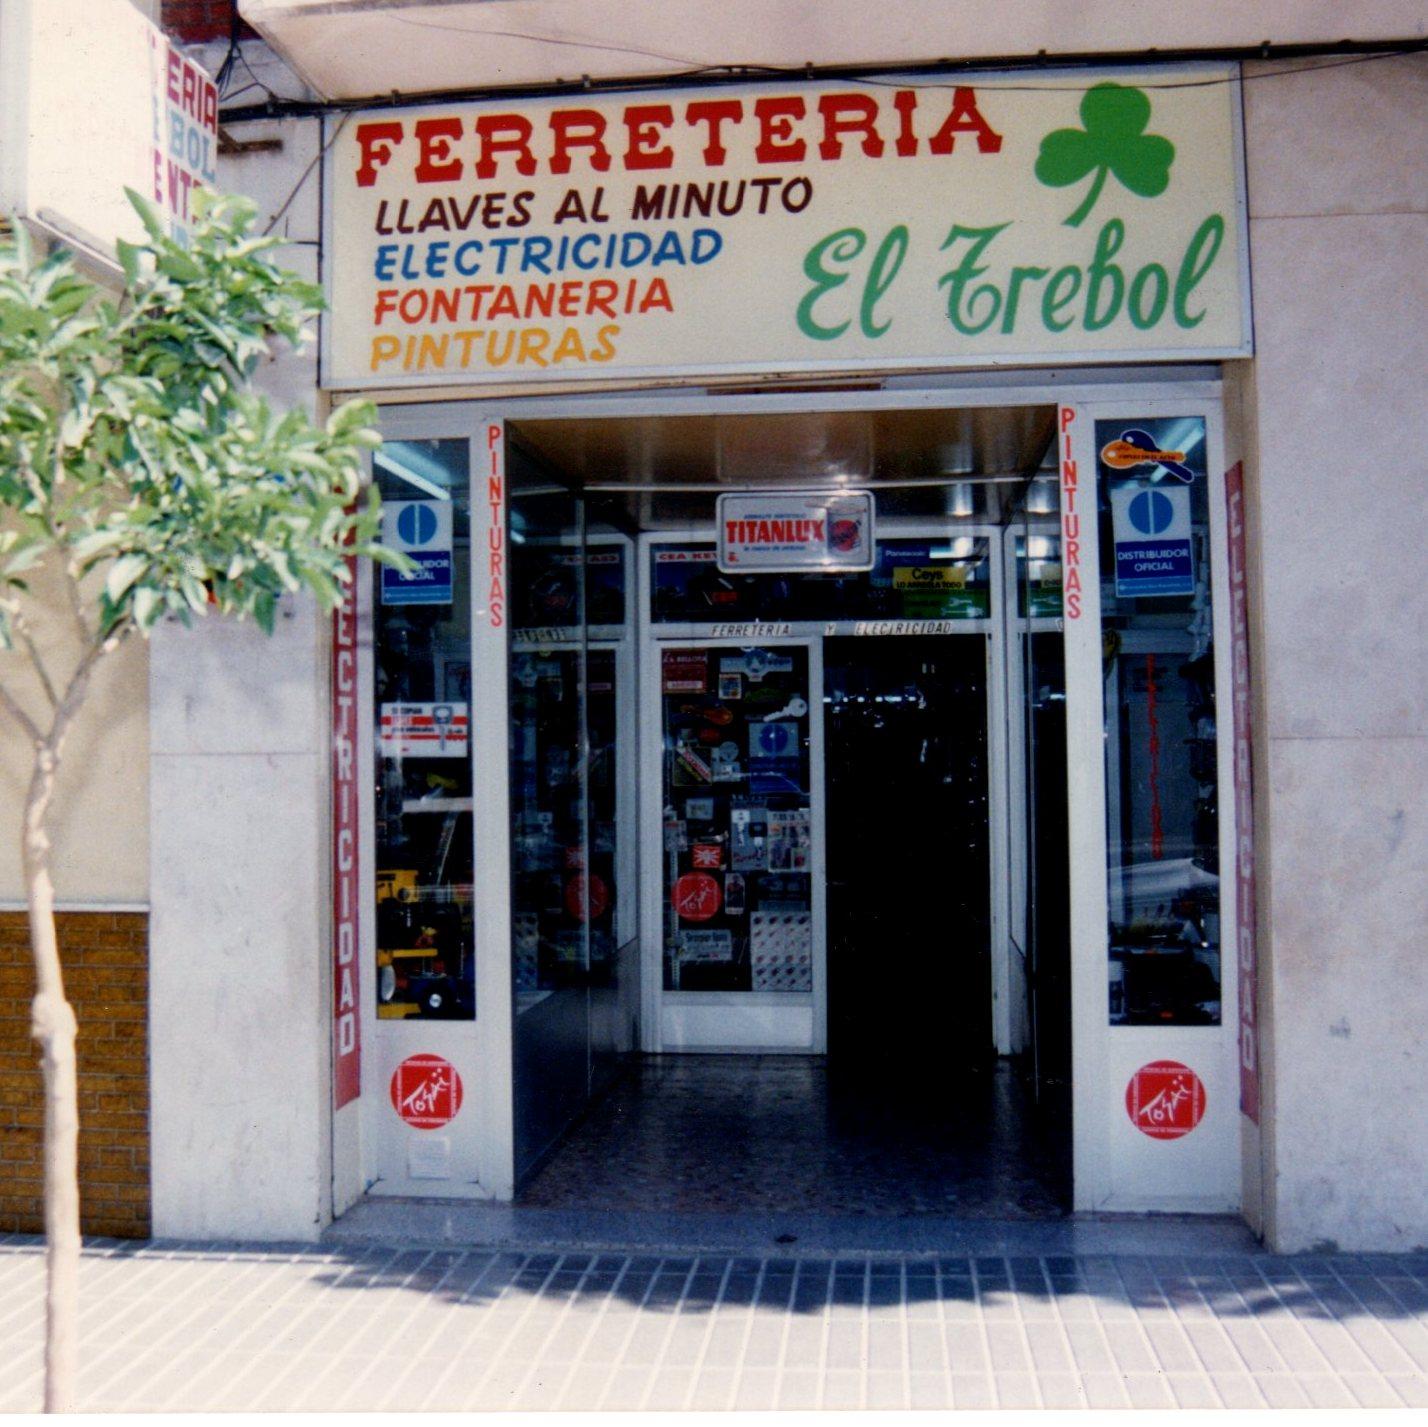 FERRETERIA EL TREBOL